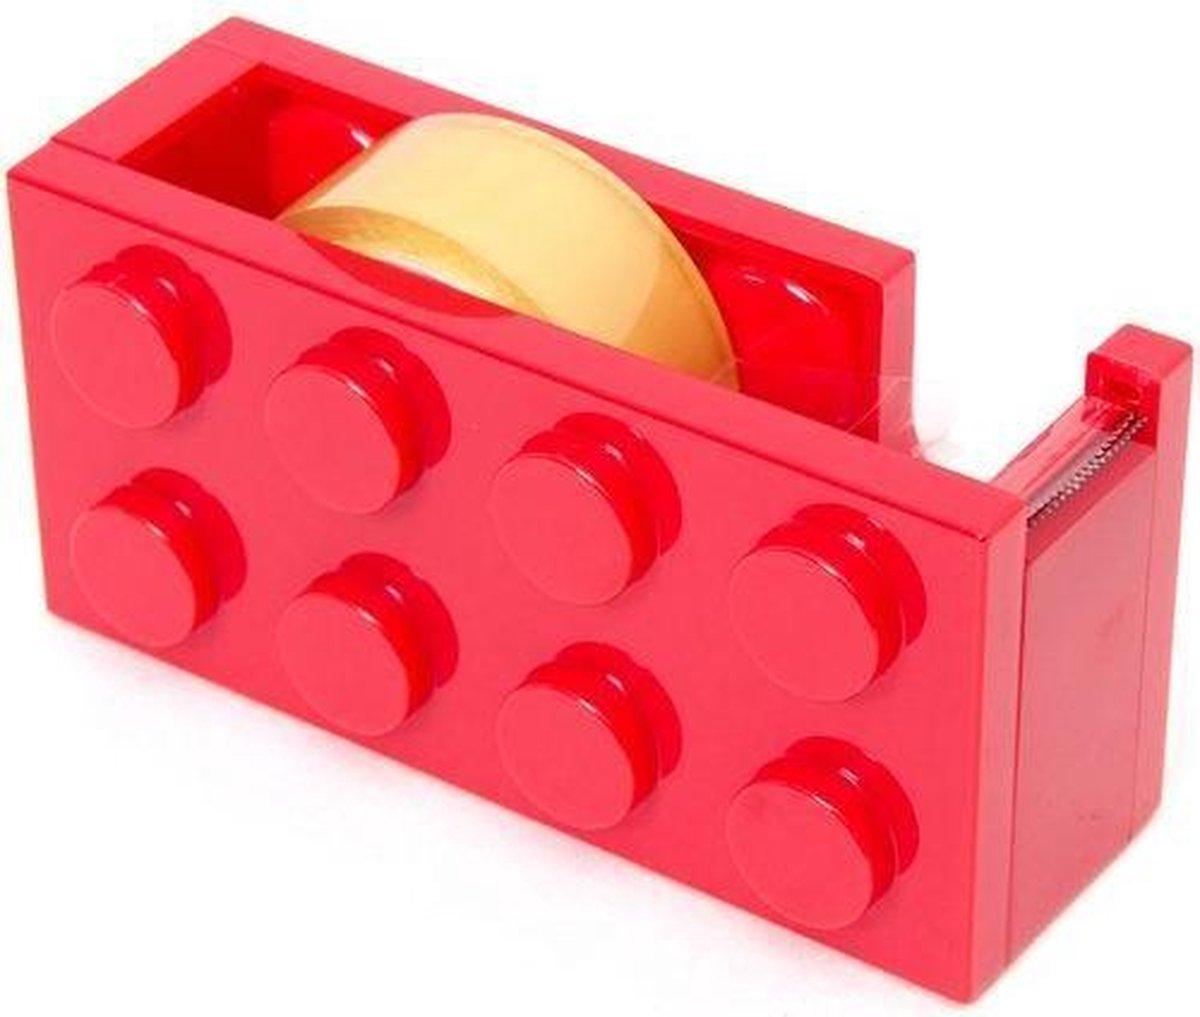 Lego blok plakband dispenser ROOD bekend van lego - set - blokjes - bouwen - figuur - kinderkamer + plakband rol - technic - city - friends - star wars - creator - ninjago - classic - harry potter lego blokje